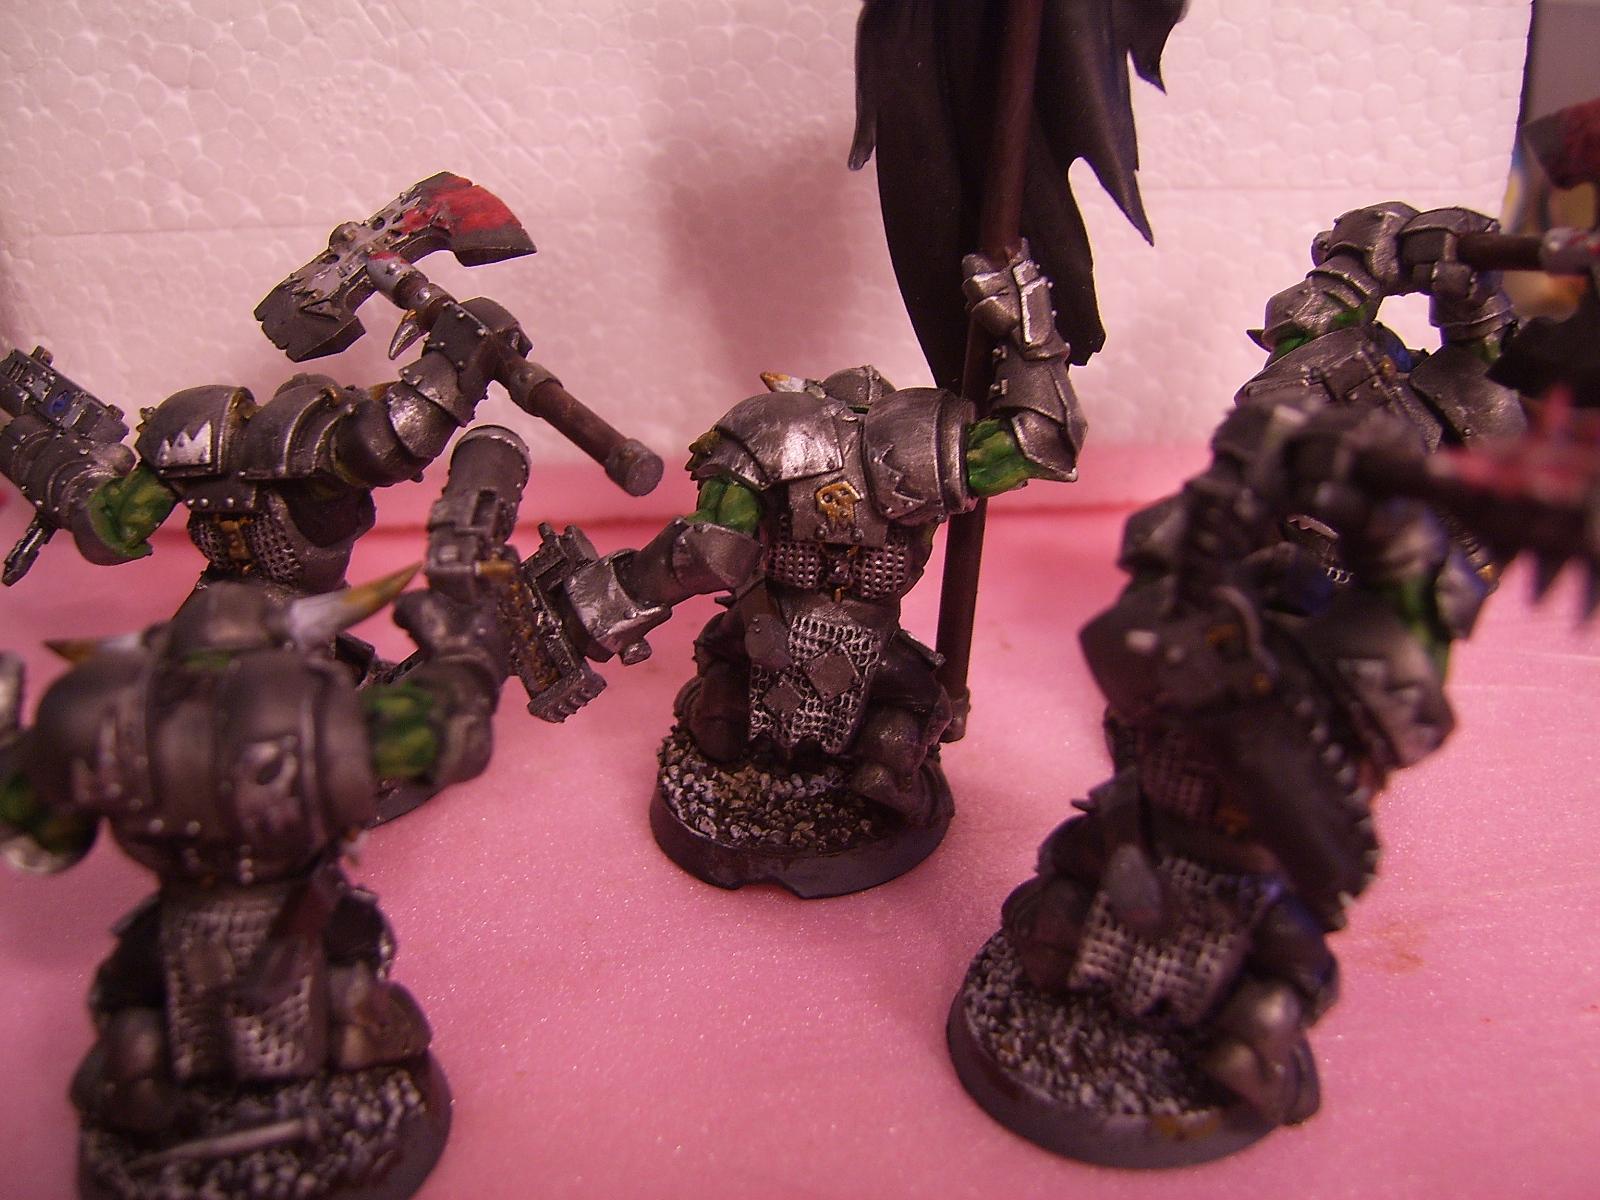 Orcs, Orks, Warhammer 40,000